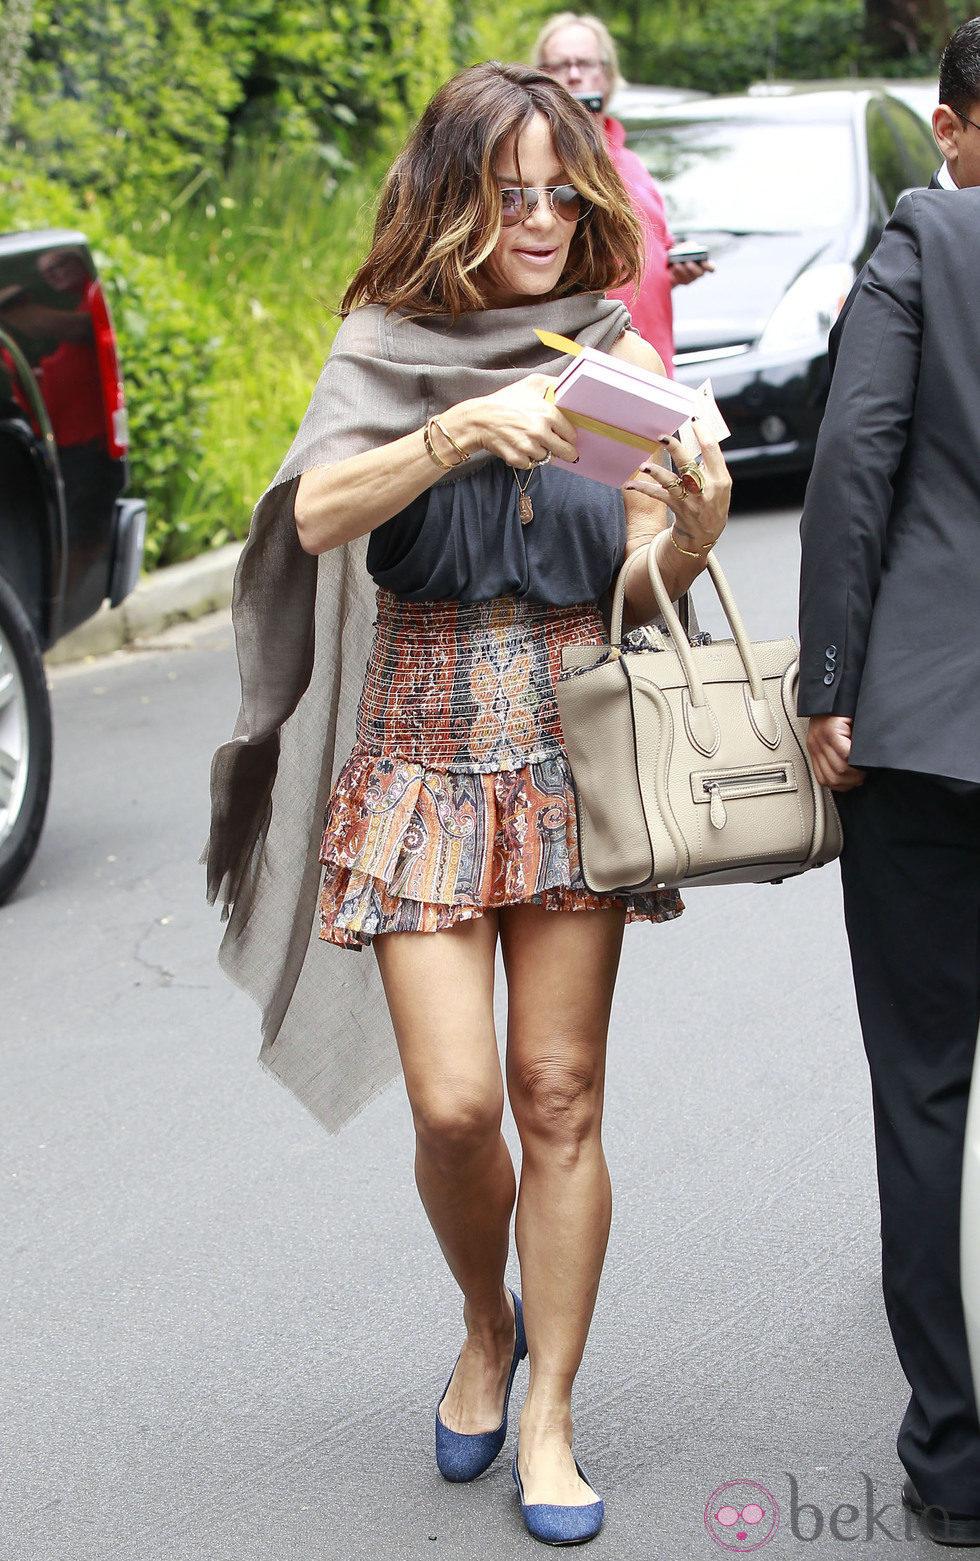 Robin Antin acude al Baby Shower de Kim Kardashian en Beverly Hills